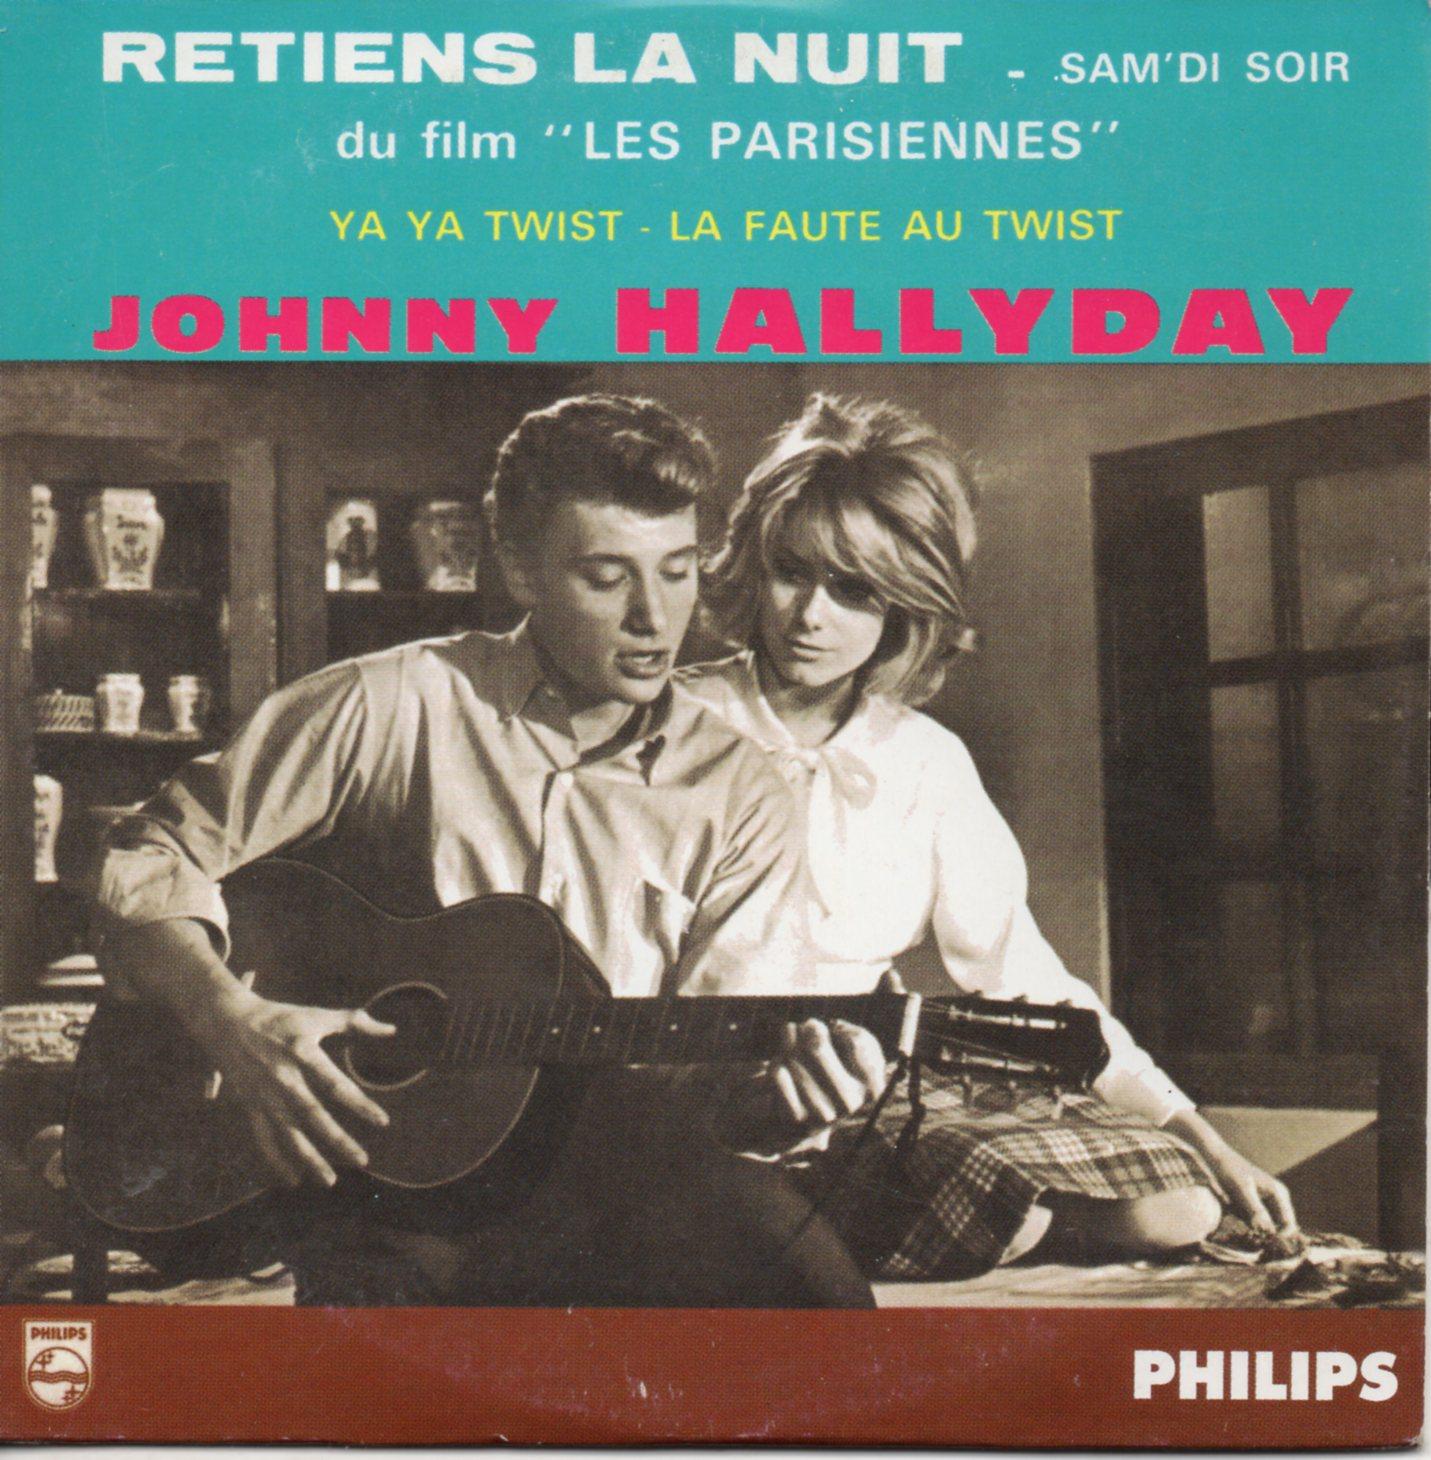 JOHNNY HALLYDAY - CATHERINE DENEUVE - SOUNDTRACK : - Retiens la nuit 4-track CARD SLEEVE  Edition numérotée avec code barre 1er tirage - CD single